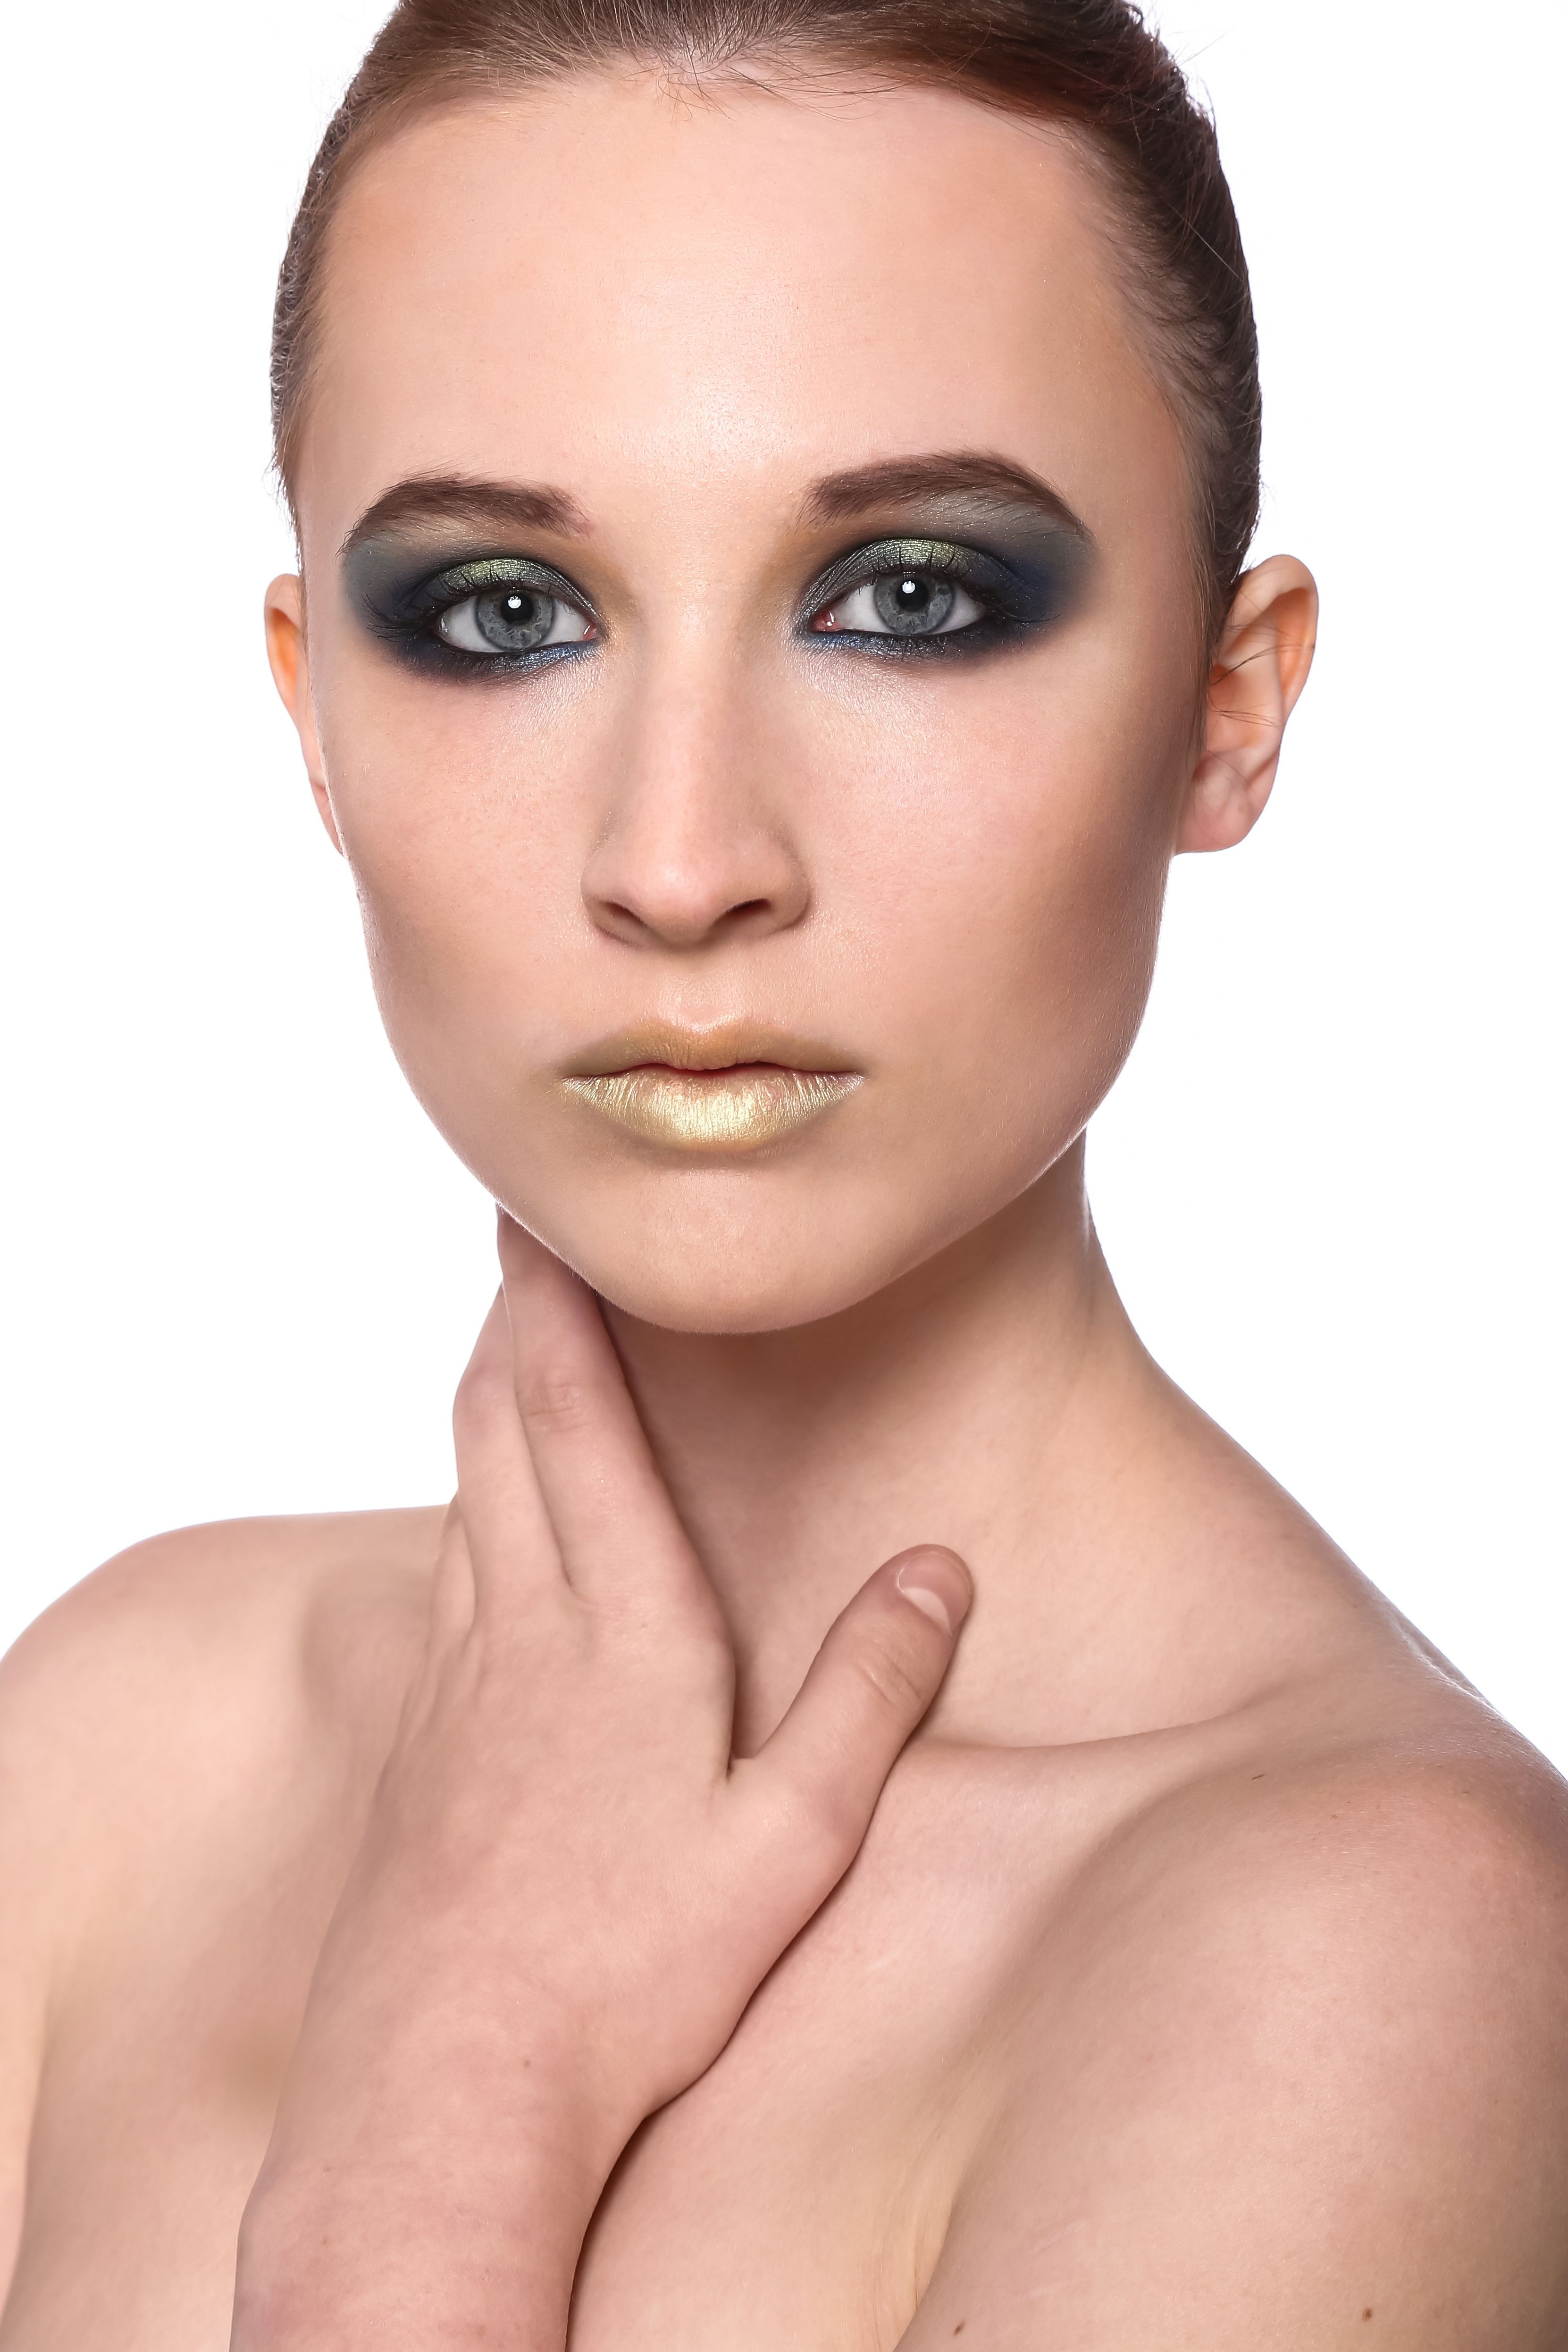 HMUA: Julia Chechik Model #MayaMoore W/ Maya Moore's Modeling Page Photogrpher: Edward Shtern #fashion #stylist #MayaMooremodel #Israel #TelAviv #Haifa #Jerusalem #photoofthday #Twitter #pinterest #instagram #Facebook #Model #MUA #HMUA #Fashion #style #Spring #summer #Fall #Winter #beauty